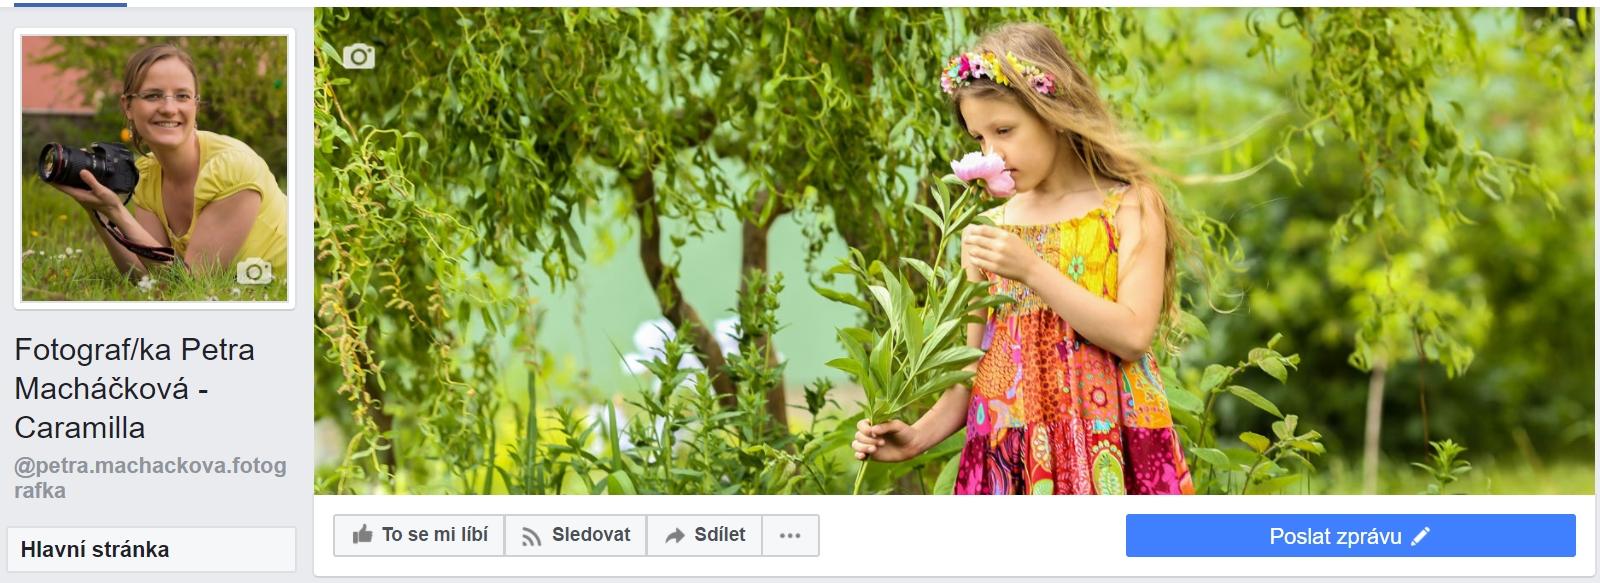 Stránka Fotograf/ka na Facebooku